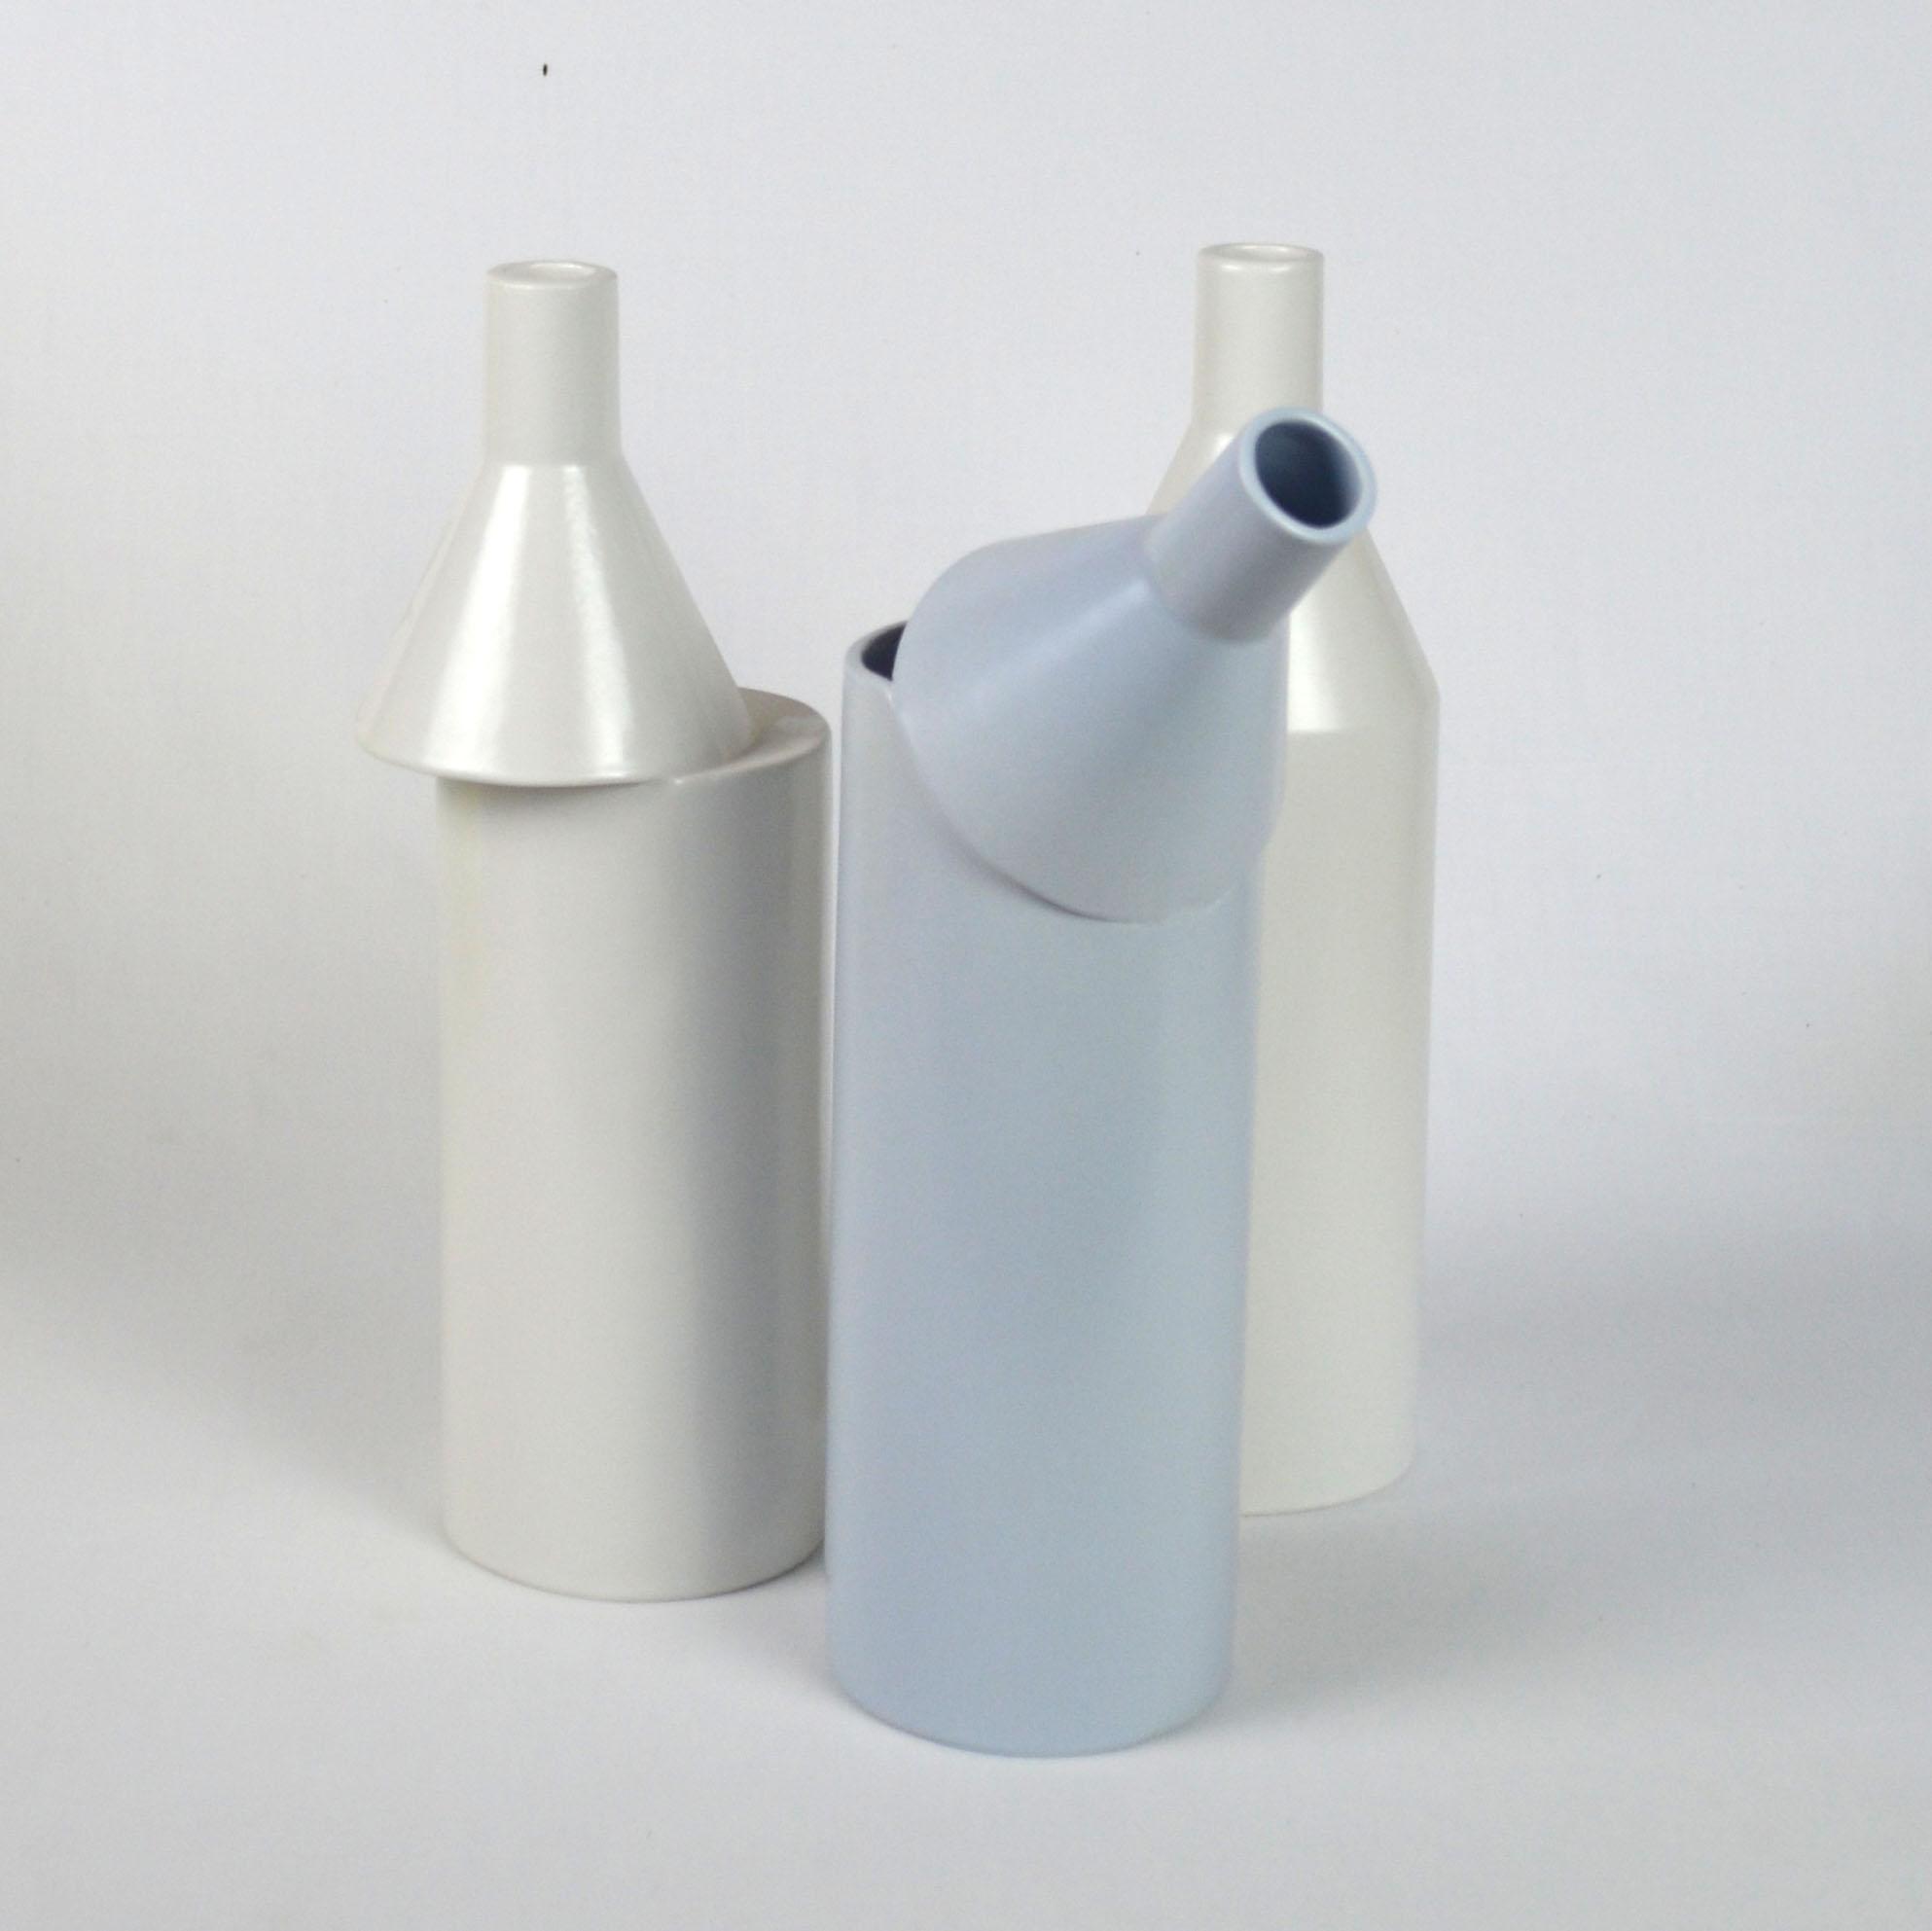 carafe-design-contemporain-faience